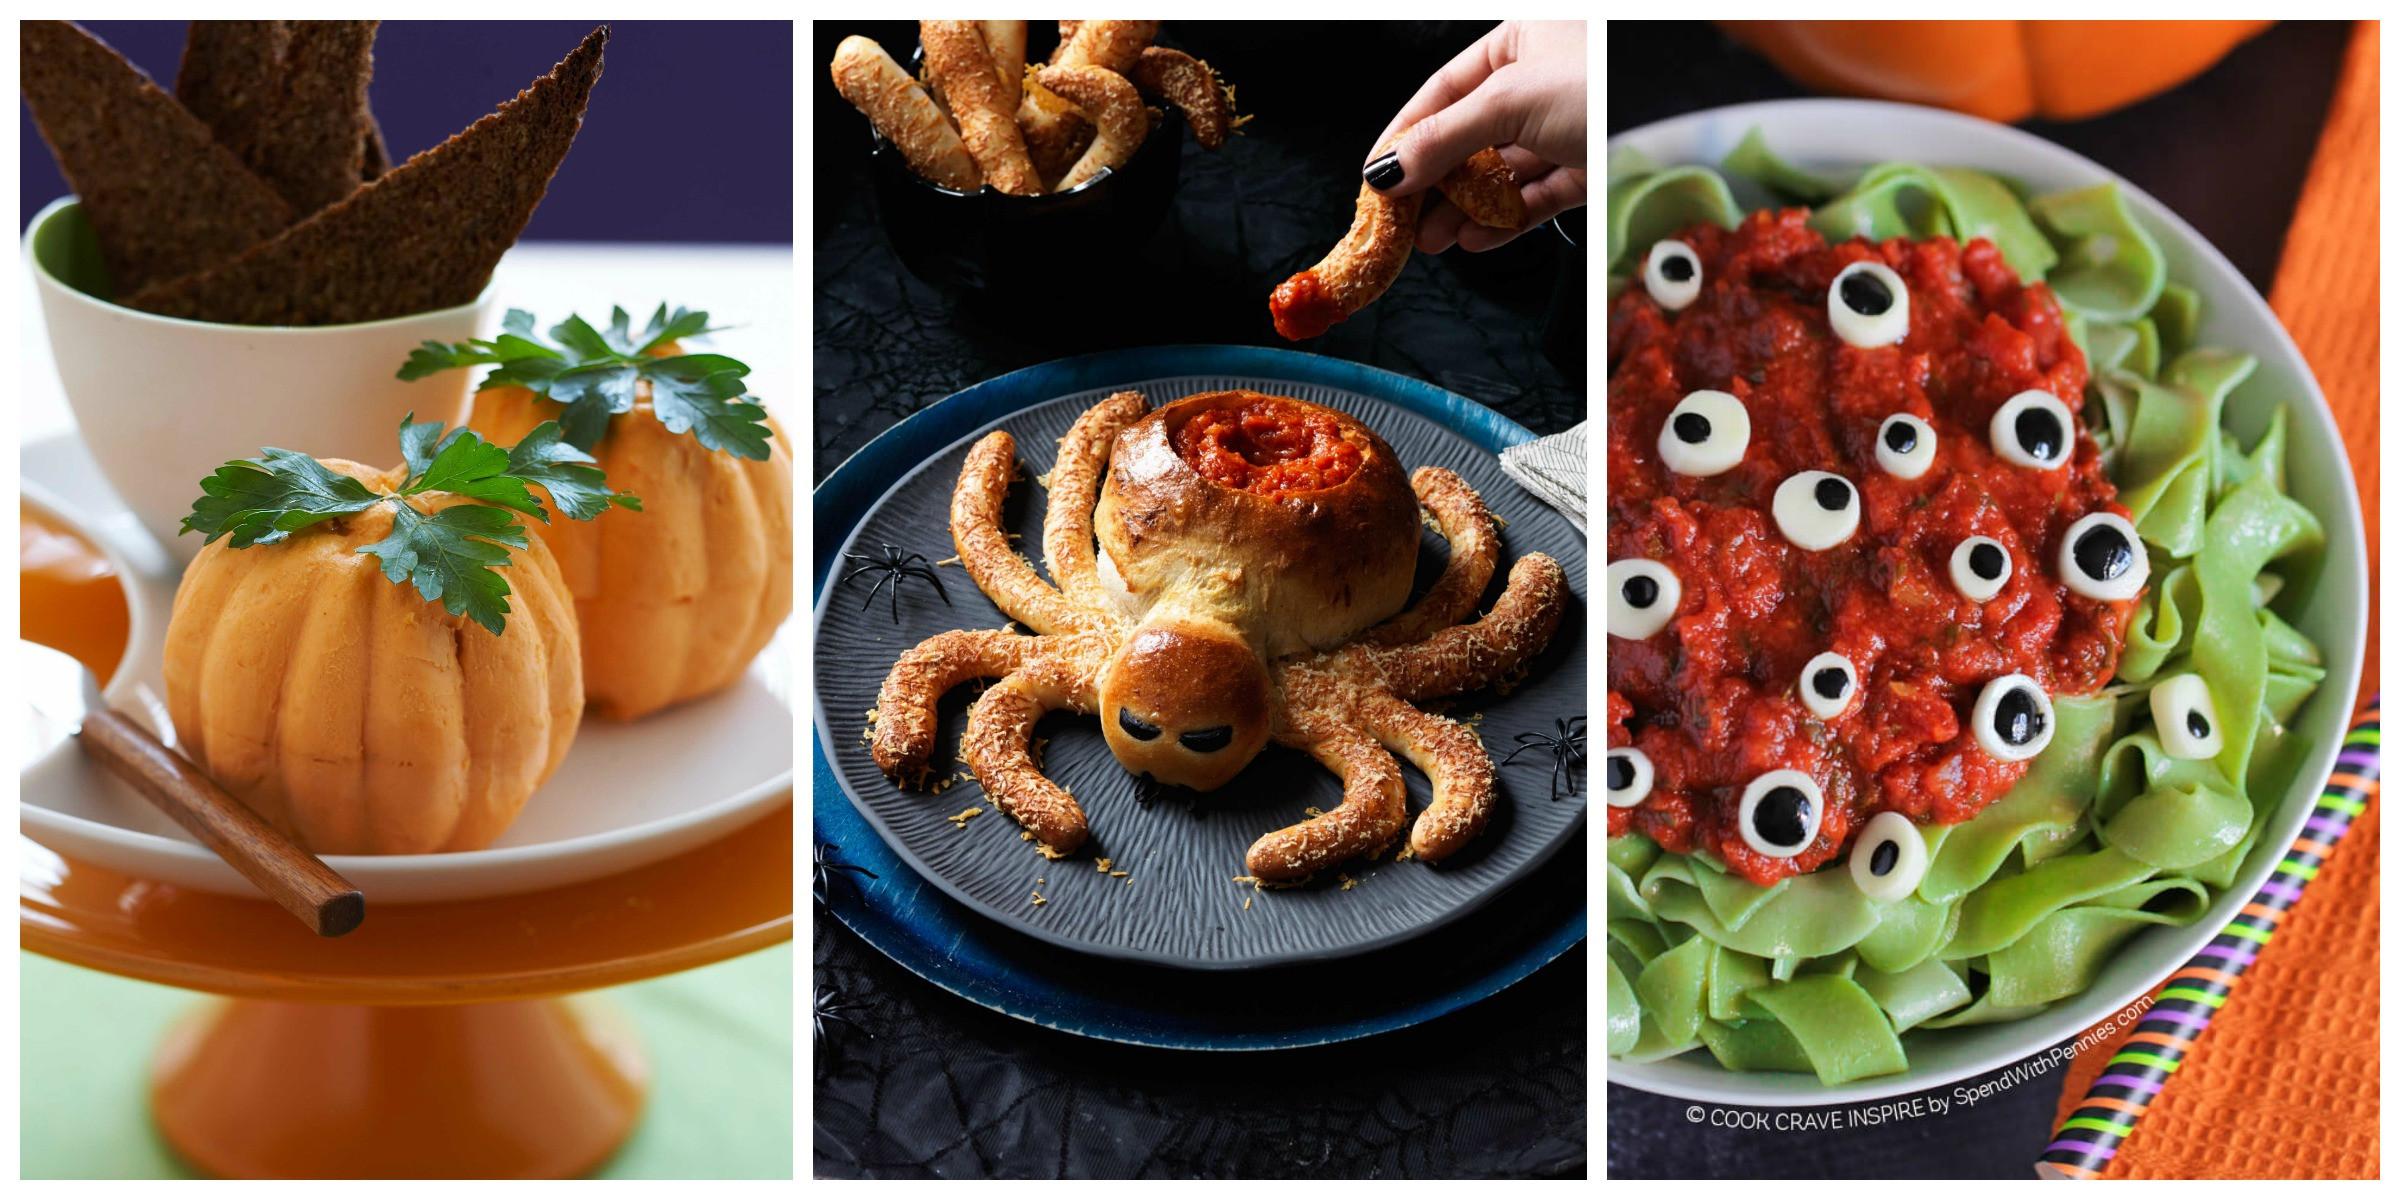 Halloween Recipes Dinner  25 Spooky Halloween Dinner Ideas Best Recipes for